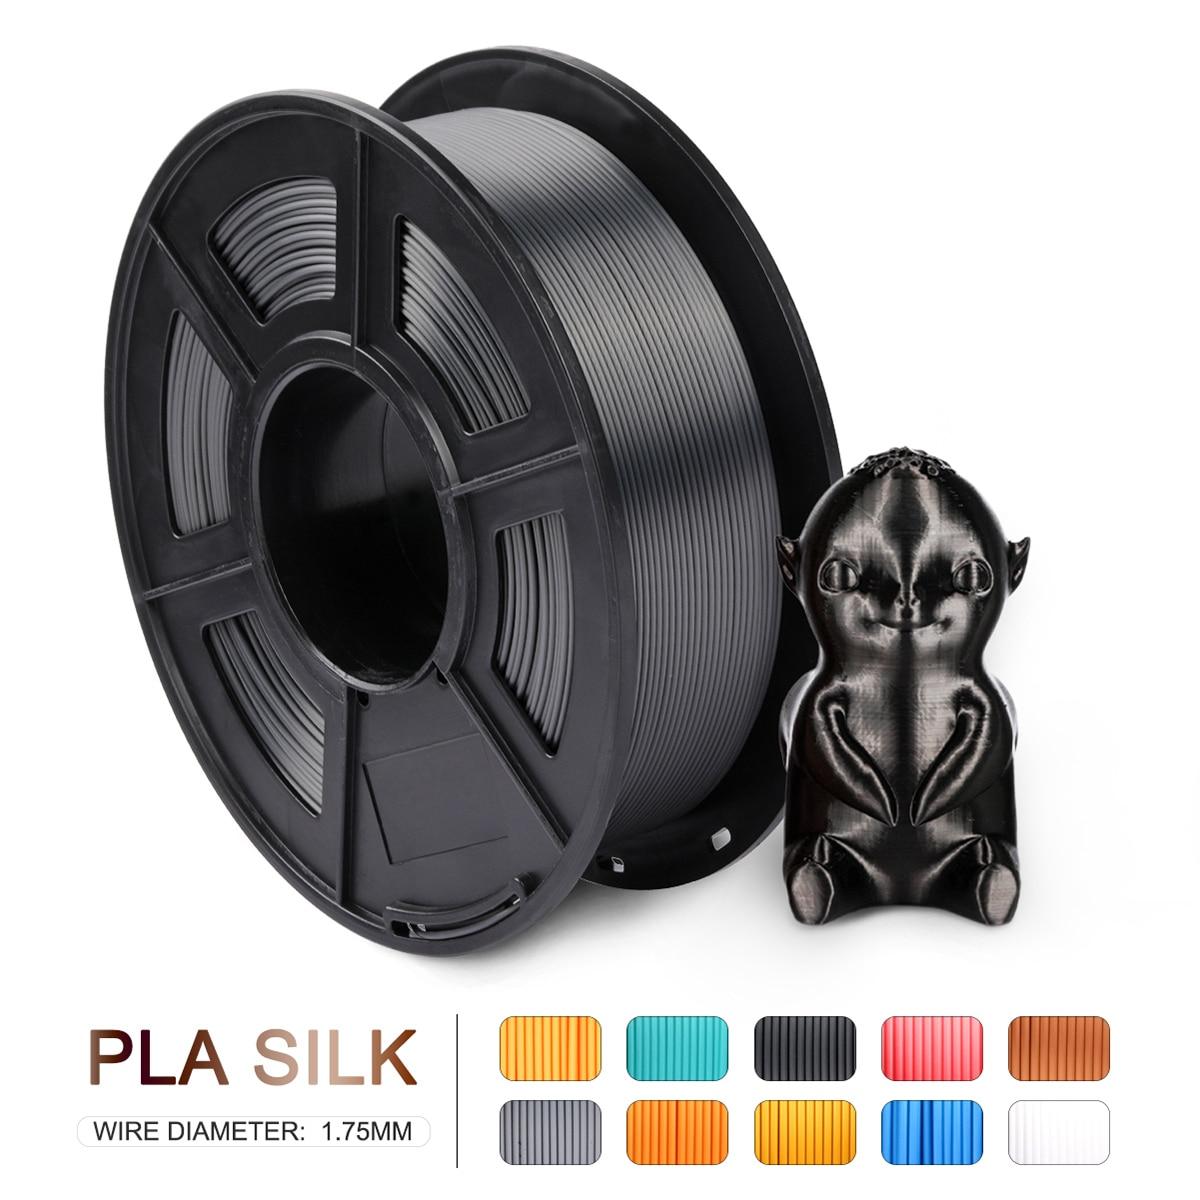 3D Printer Silk Filament classical Black FDM support material nylon Polymer 3D Print material 1.75mm Plastic stability uv resin